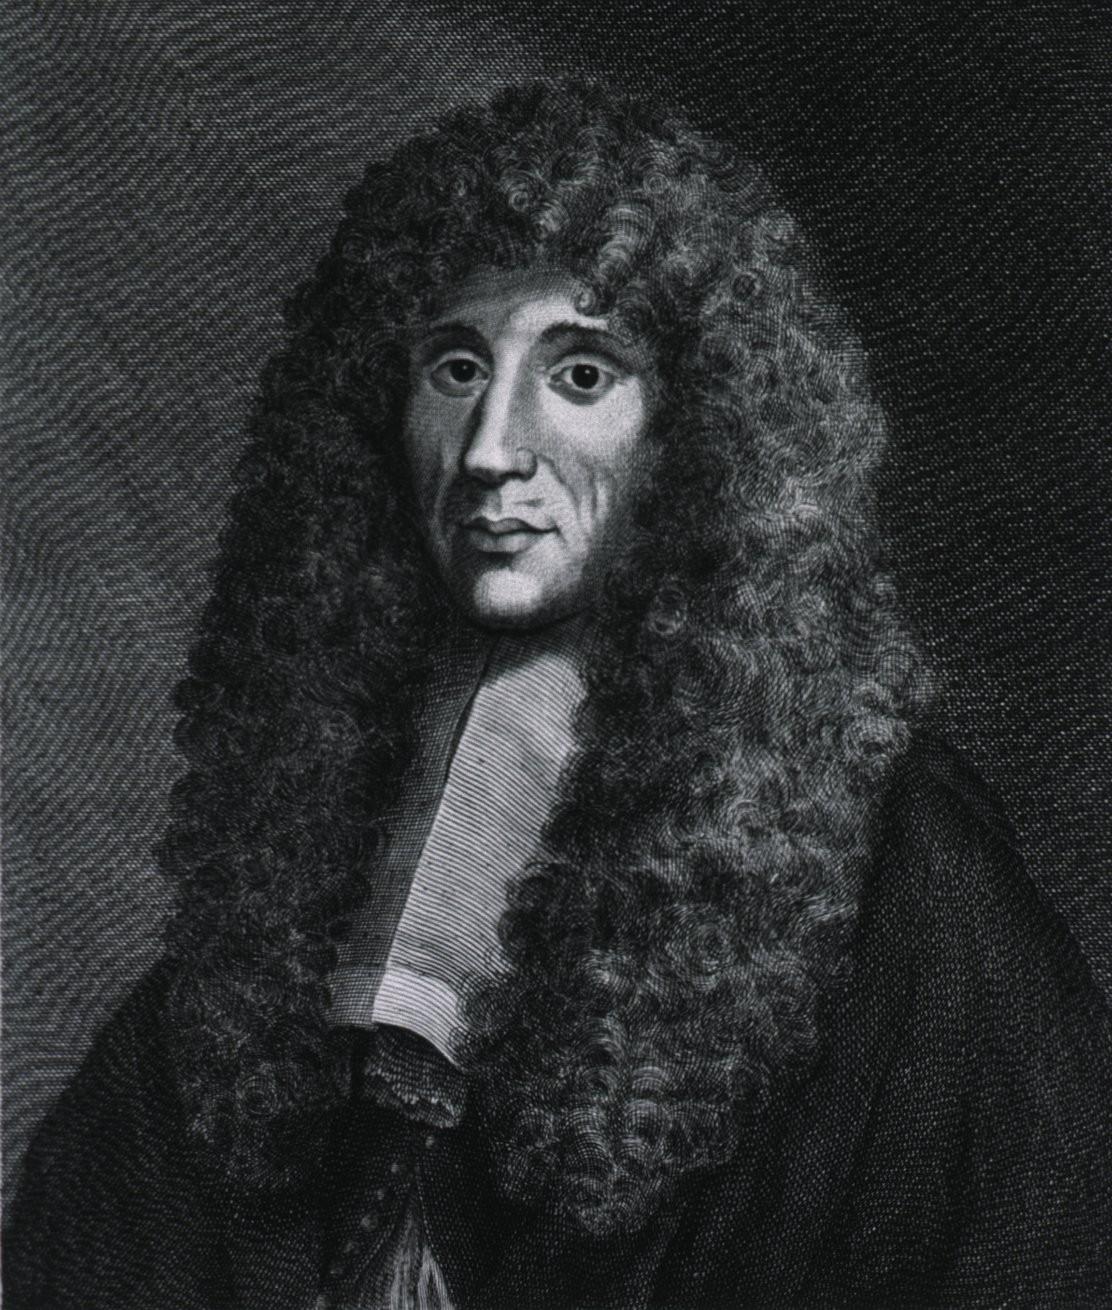 Francesco Redi (18 Şubat 1626 - 1 Mart 1697)